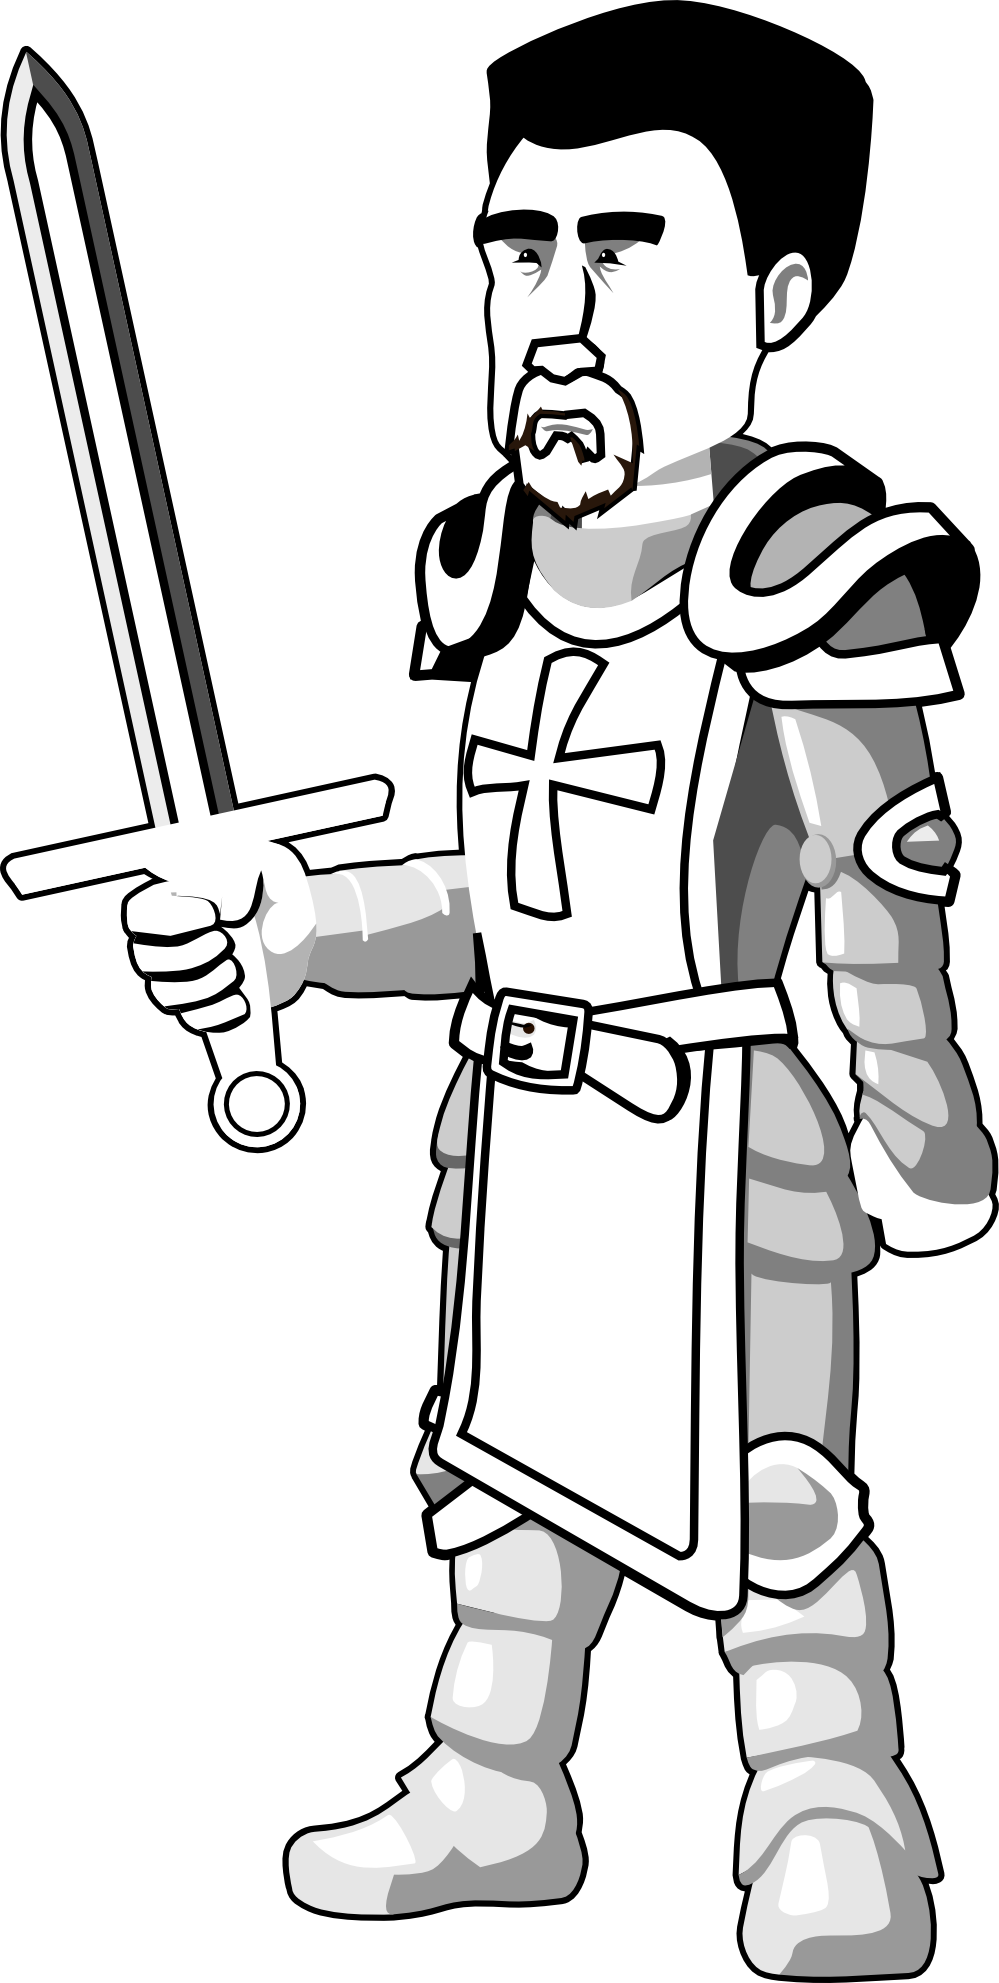 Guerrero clipart graphic transparent Knight clipart guerrero, Knight guerrero Transparent FREE for ... graphic transparent